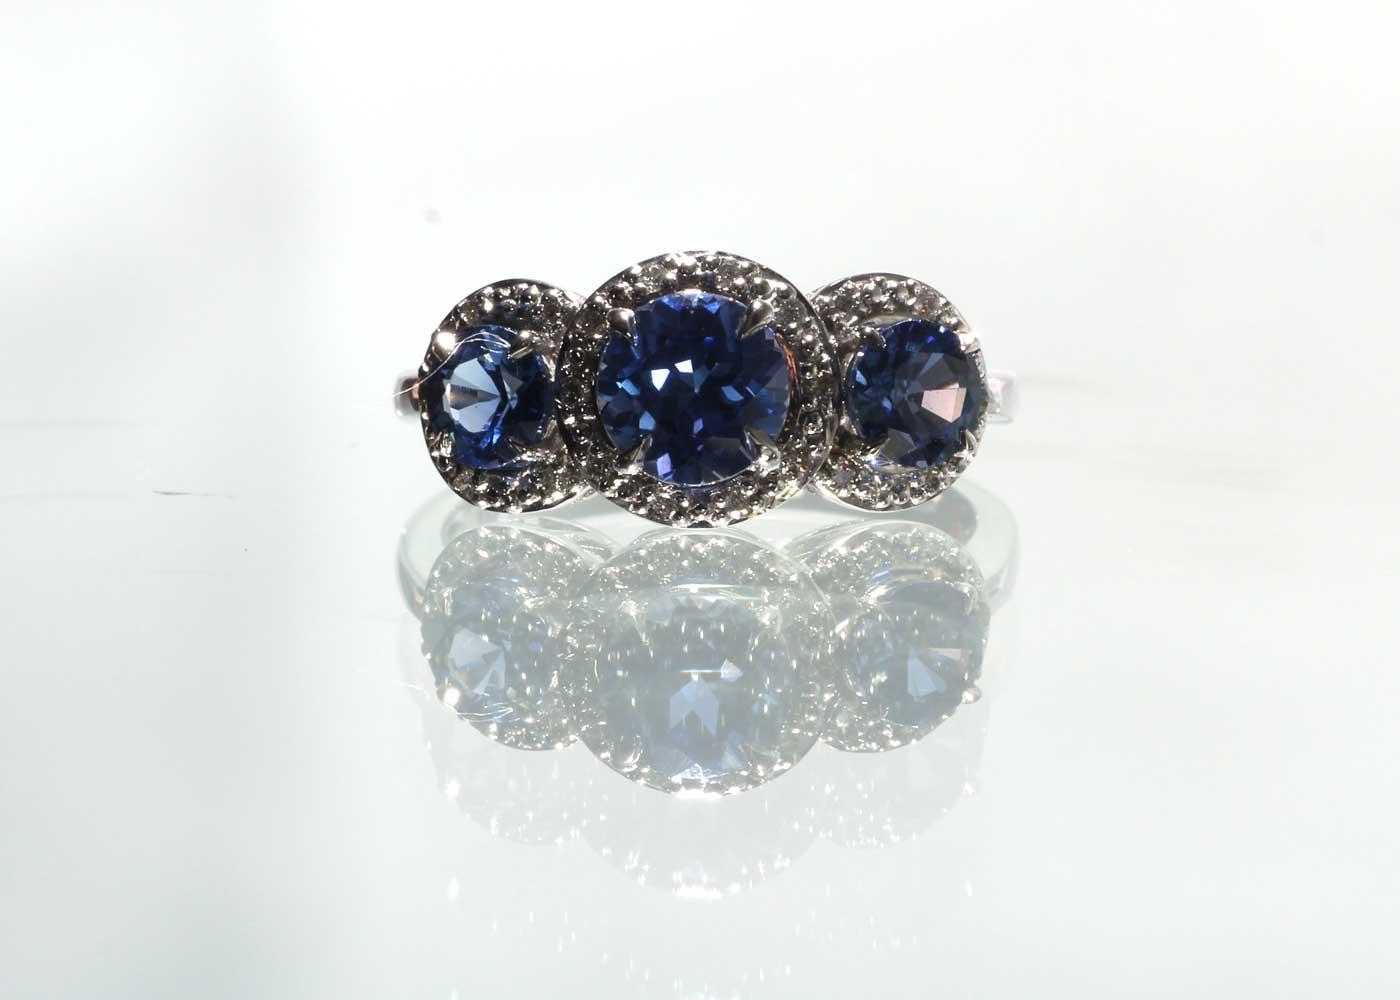 9ct White Gold Created Ceylon Sapphire And Diamond Ring - Image 2 of 6